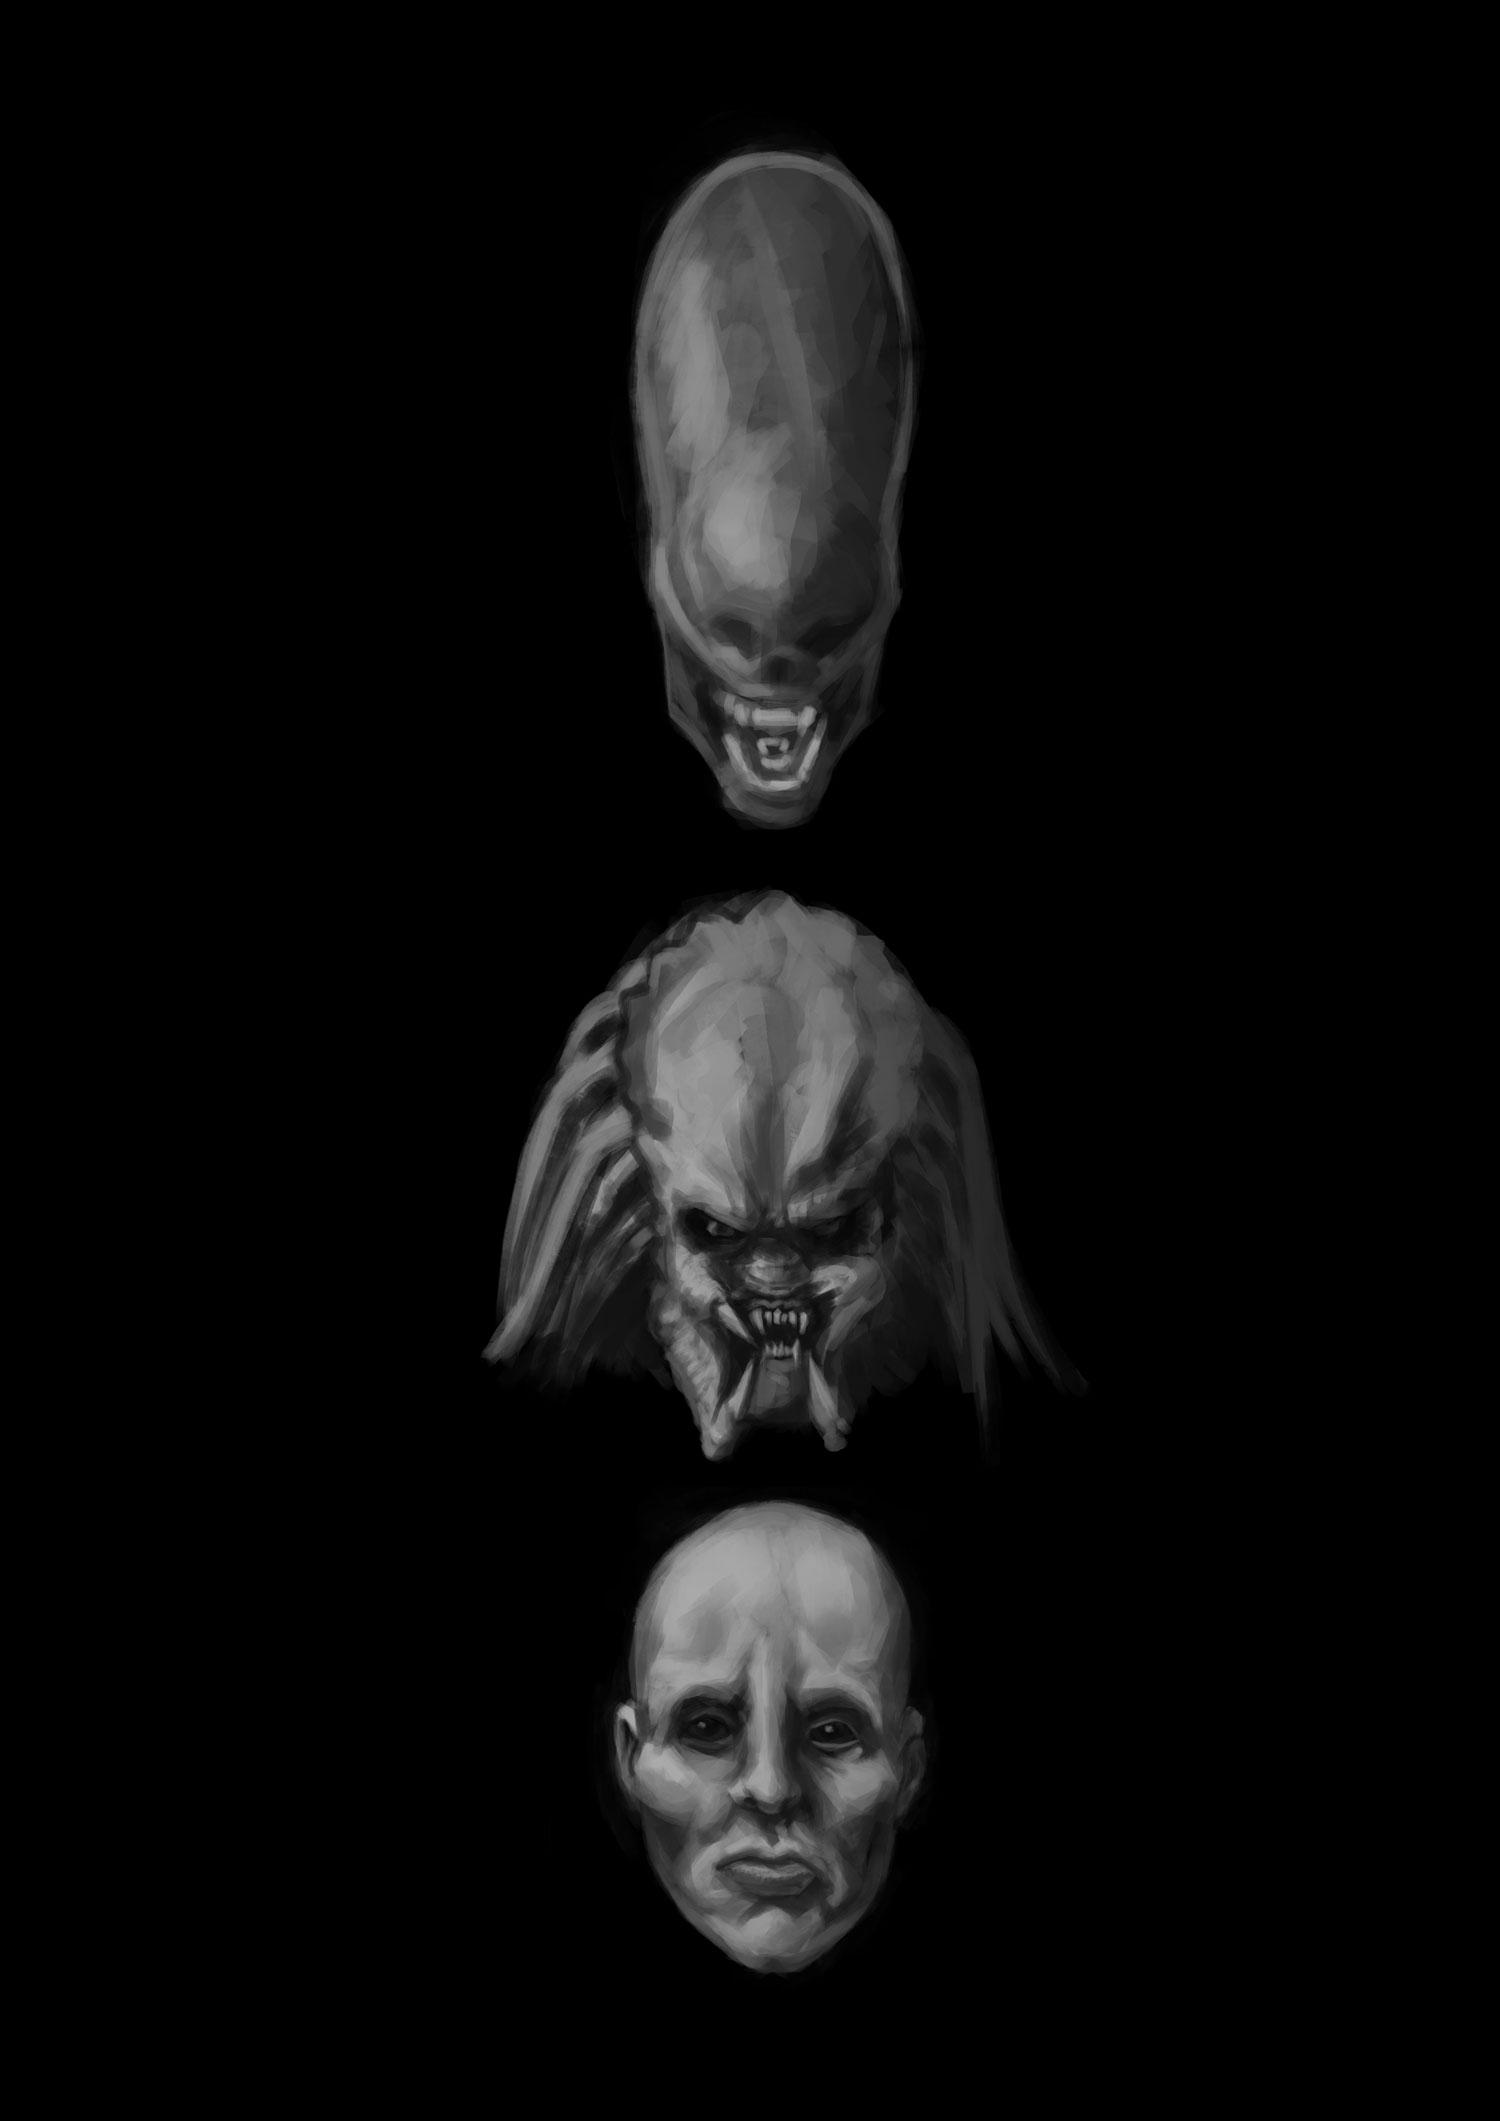 [Image: alienpredatorengineer_by_andrew_gibbons-dbf7a5d.jpg]